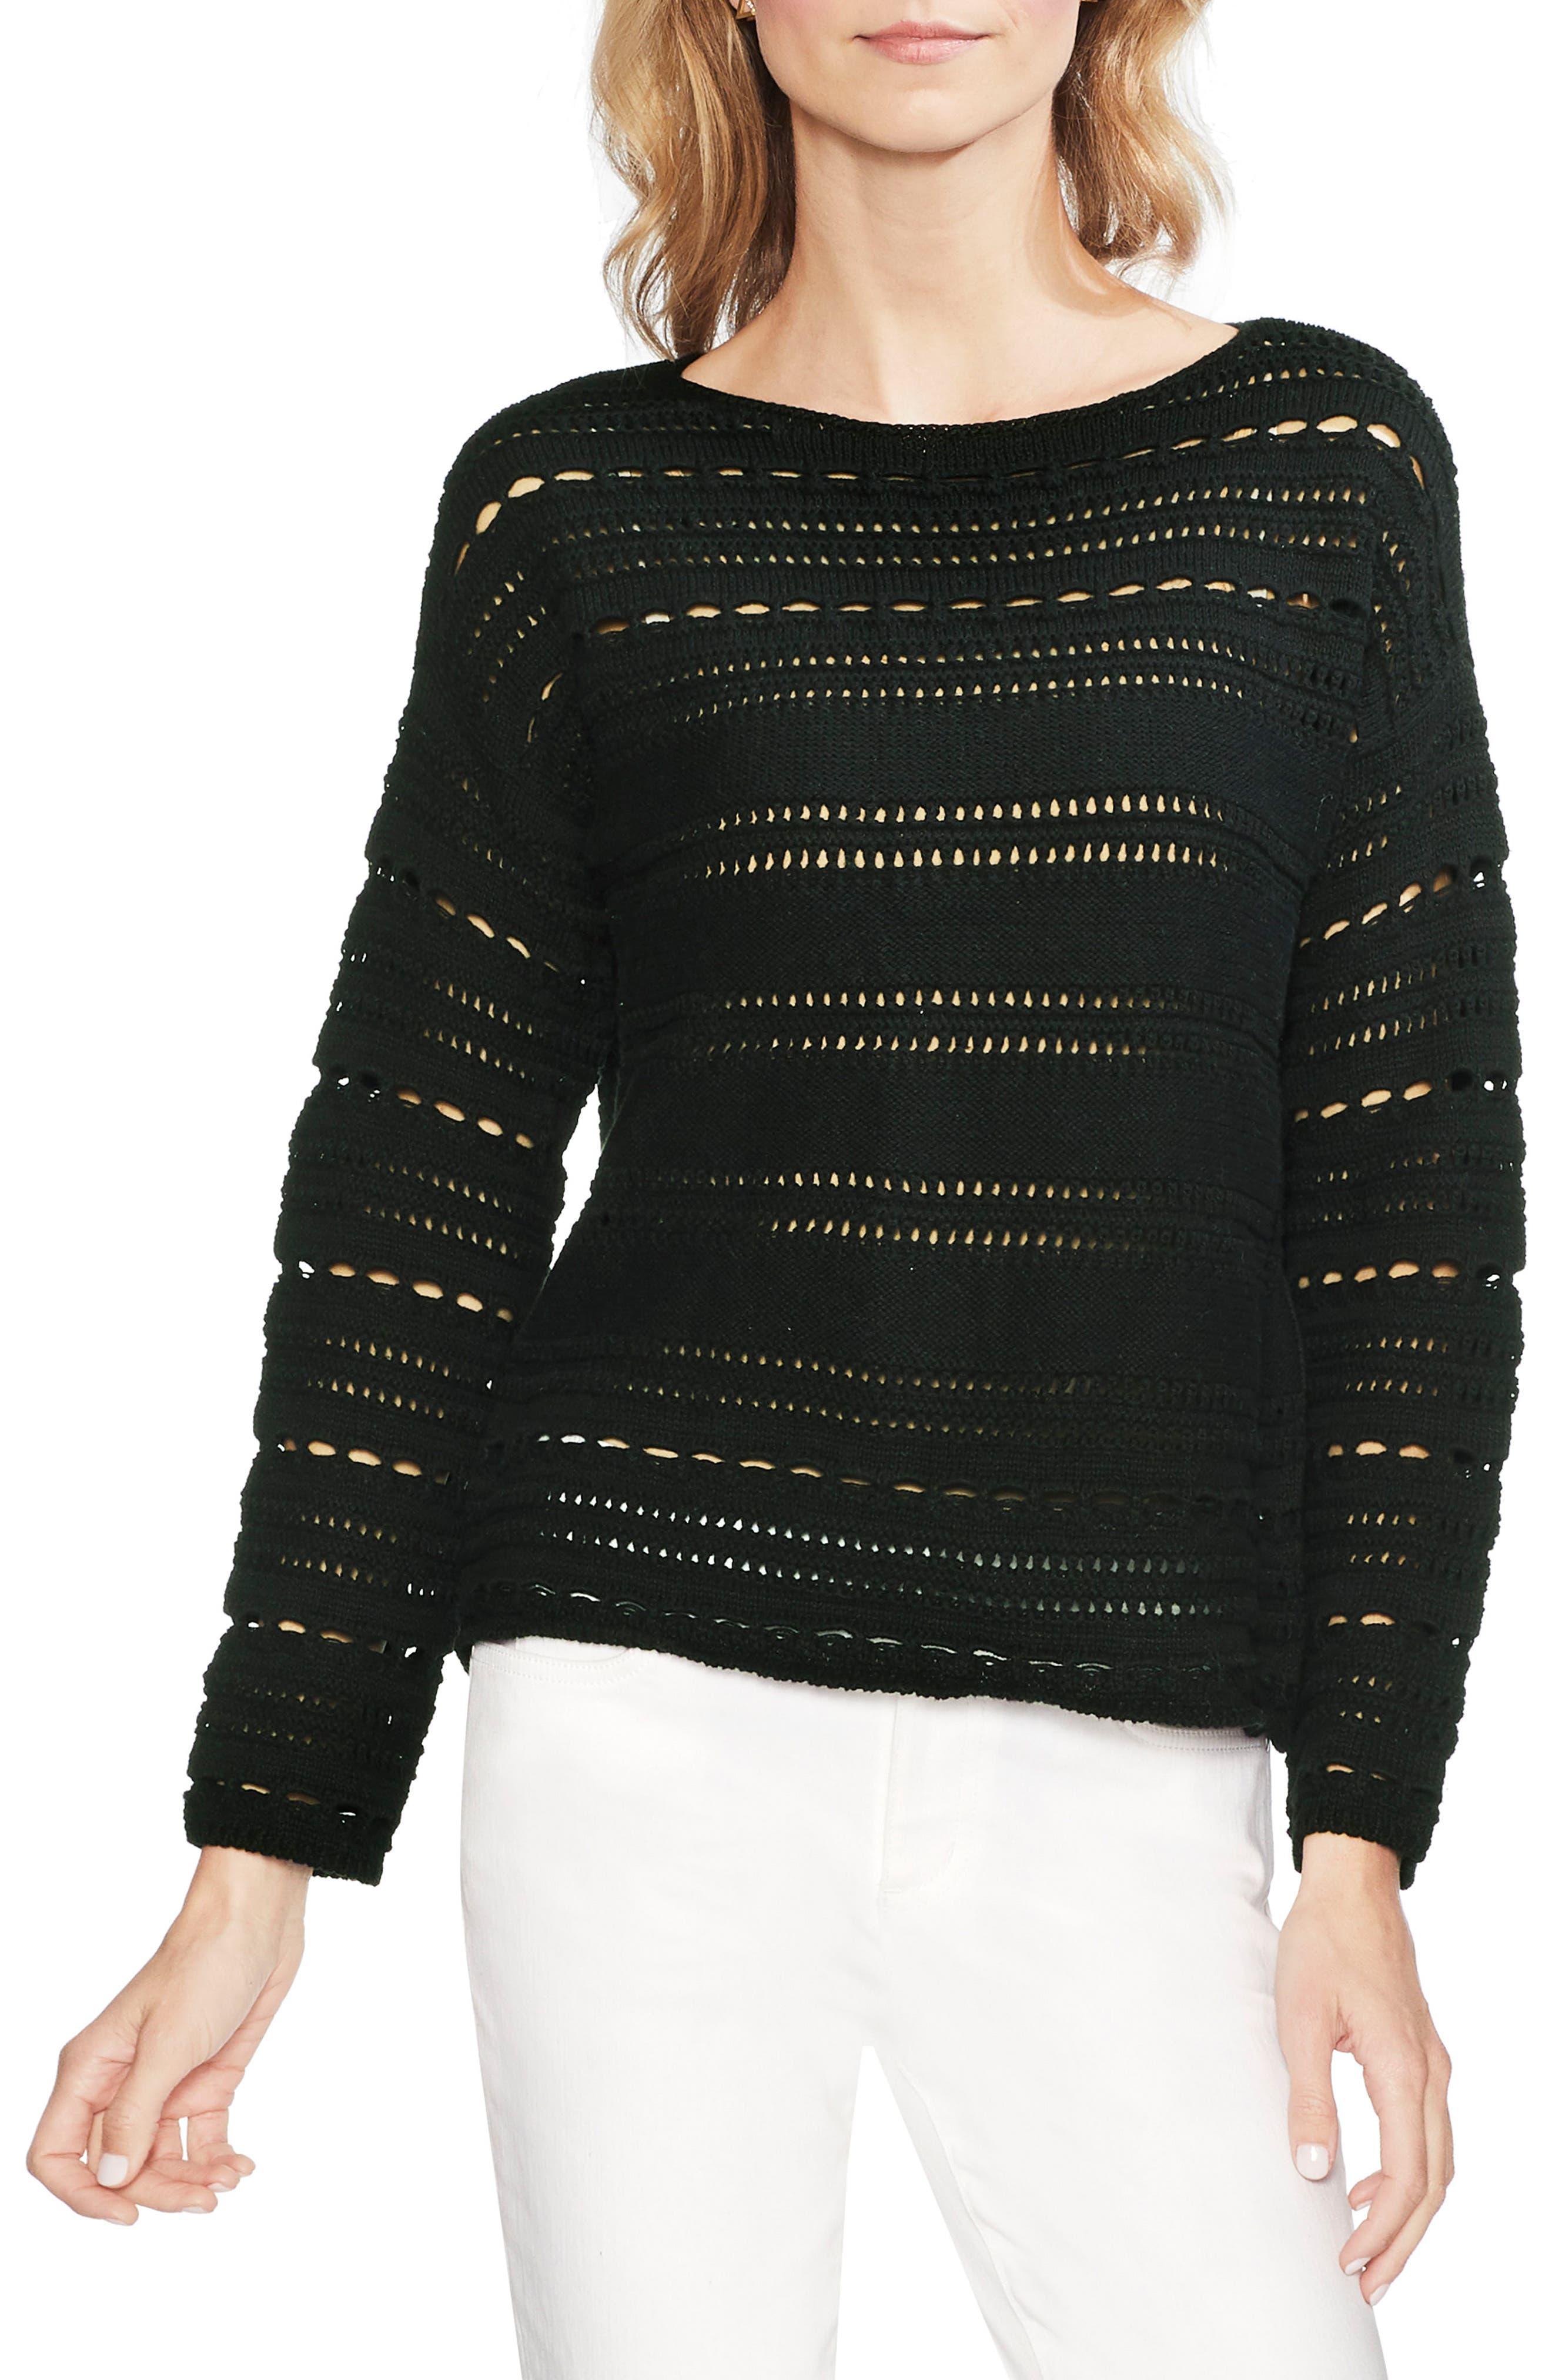 Vince Camuto Open Stitch Cotton Sweater, Black